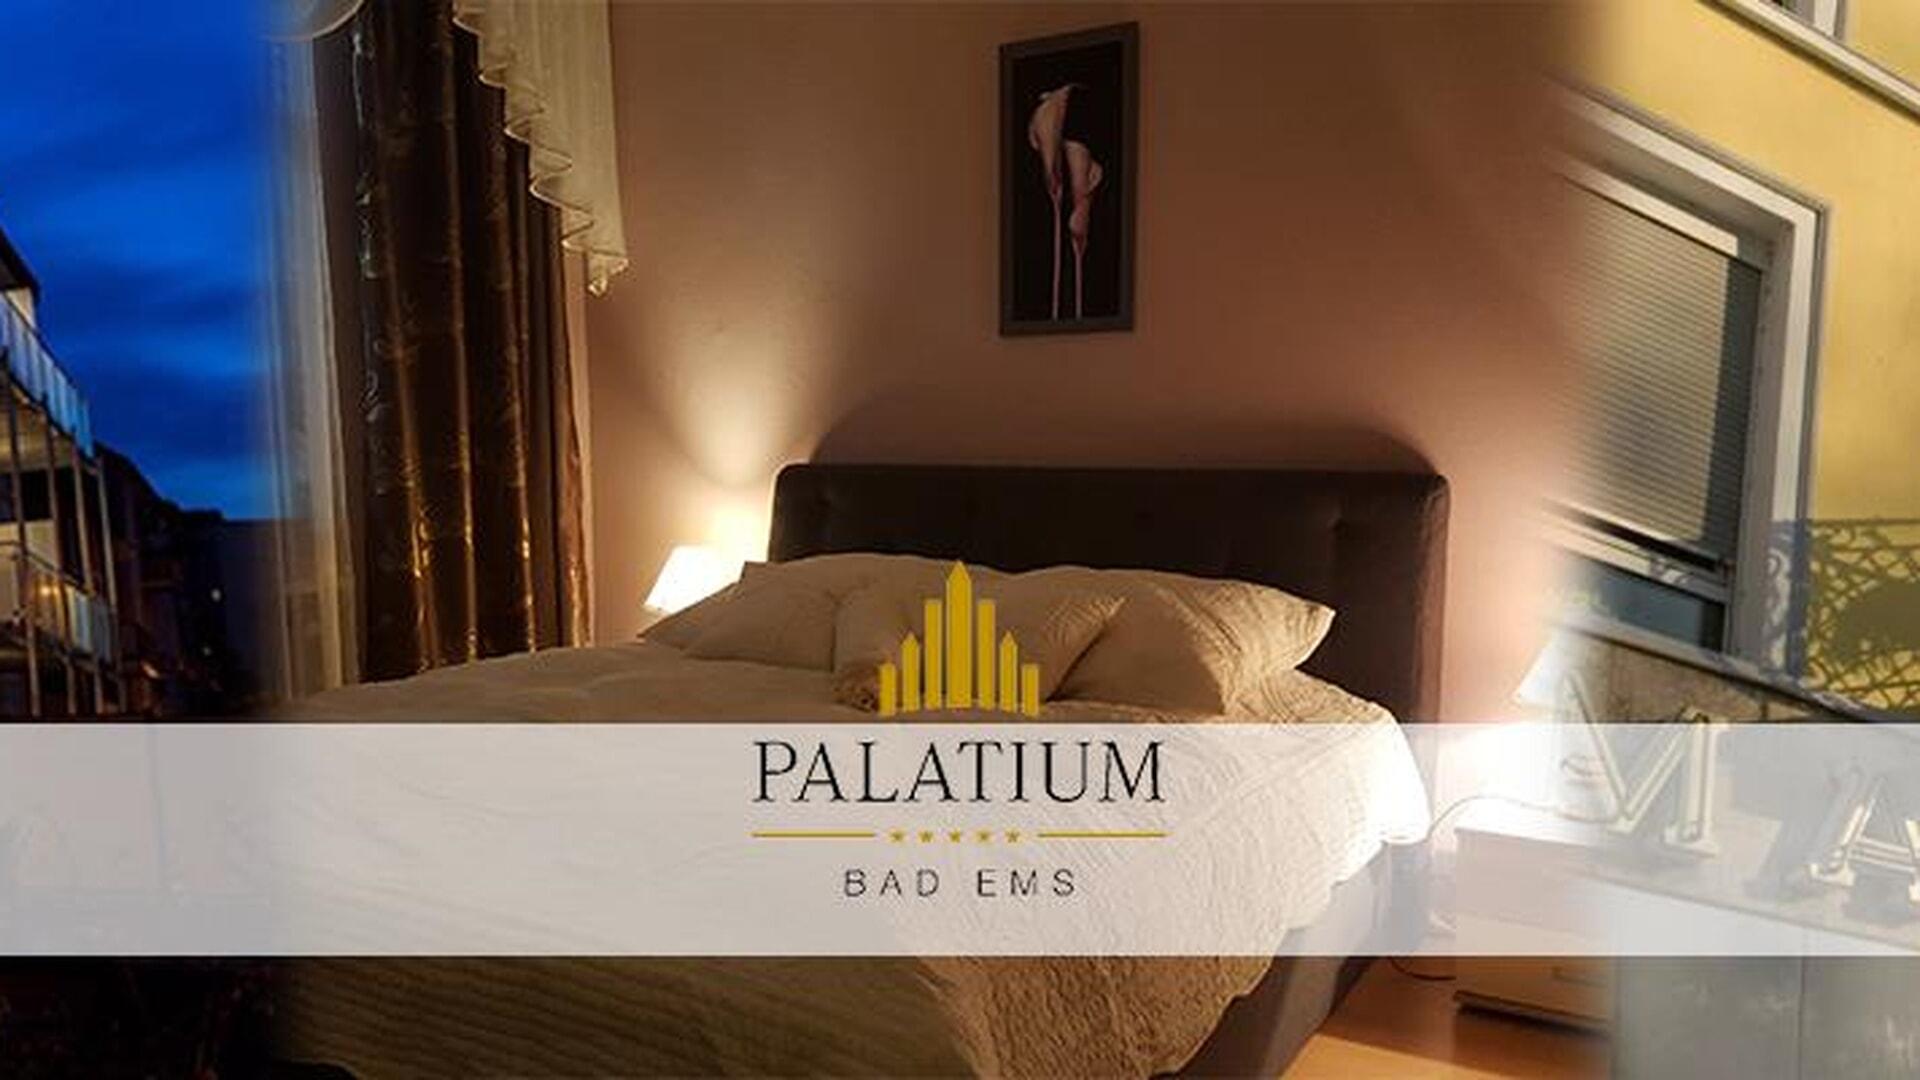 Palatium Bad Ems